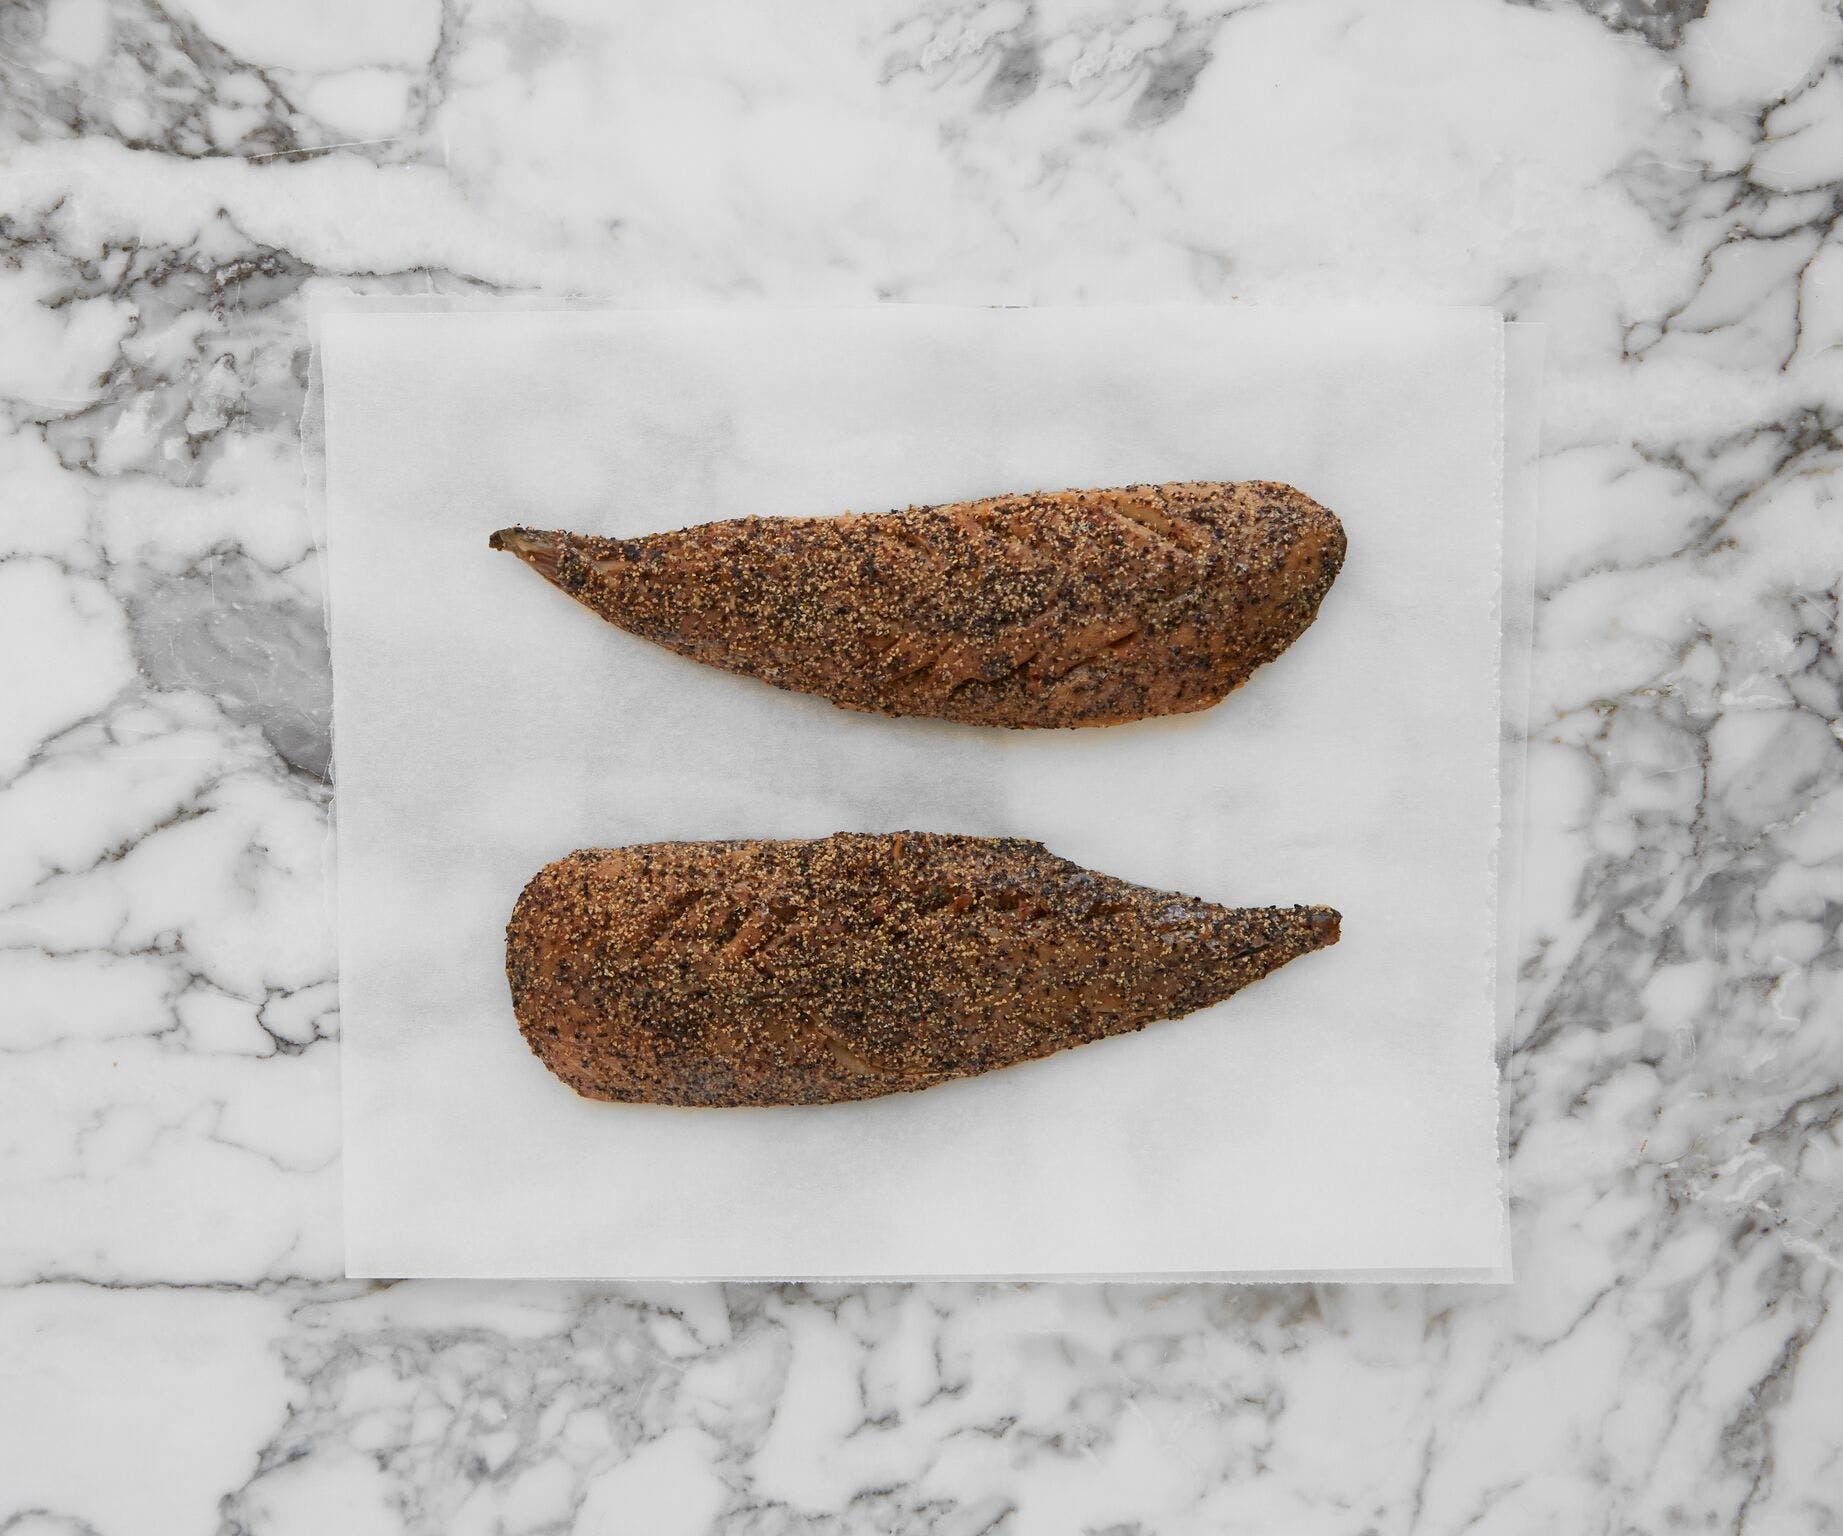 Hot Smoked Peppered Mackerel